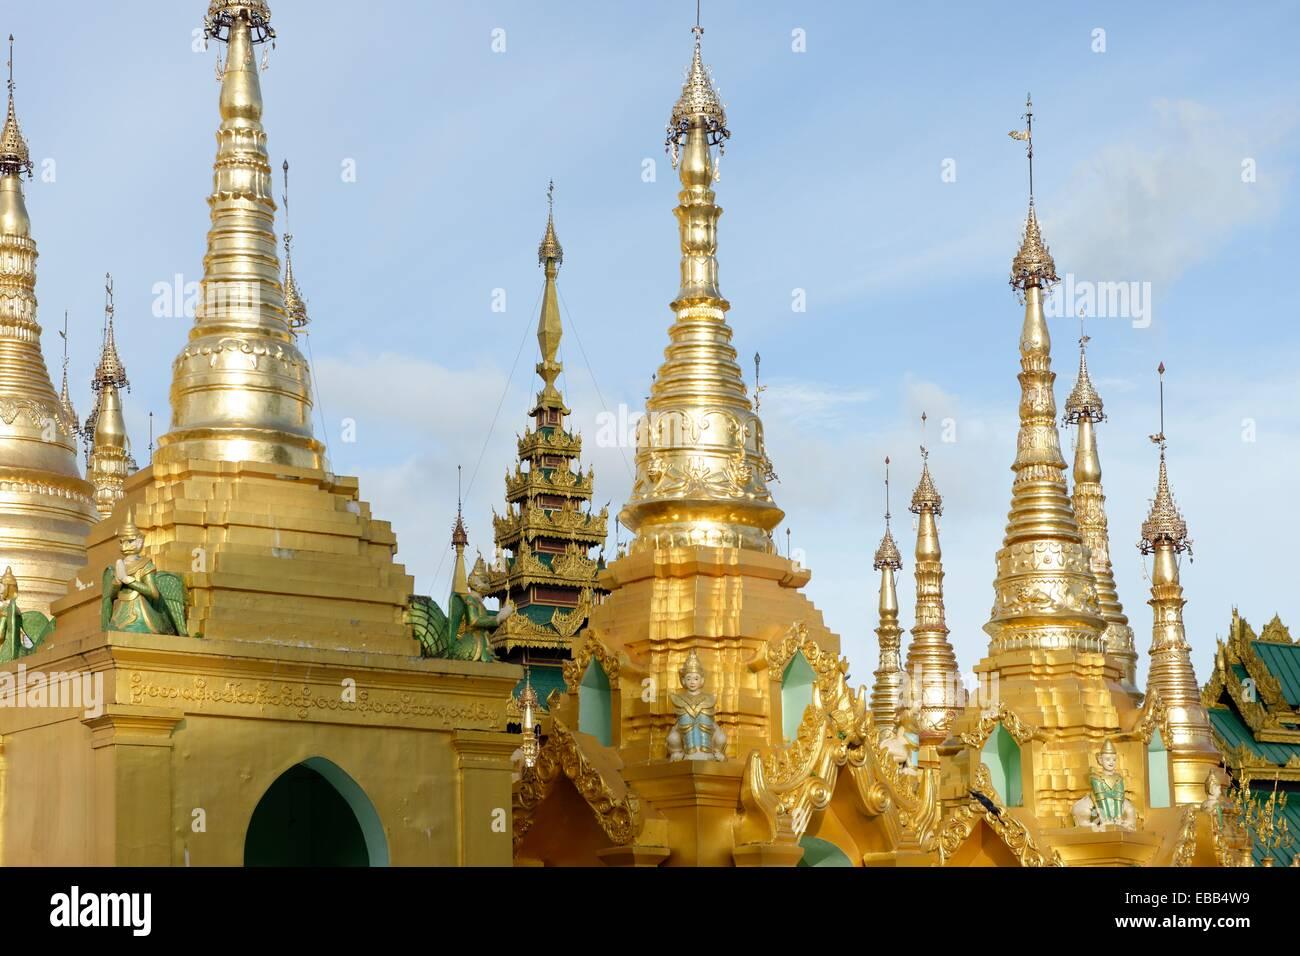 325 4 8 99 architecture art Asia Buddha Buddhism building built structure Burma Burmese color image column dagon - Stock Image